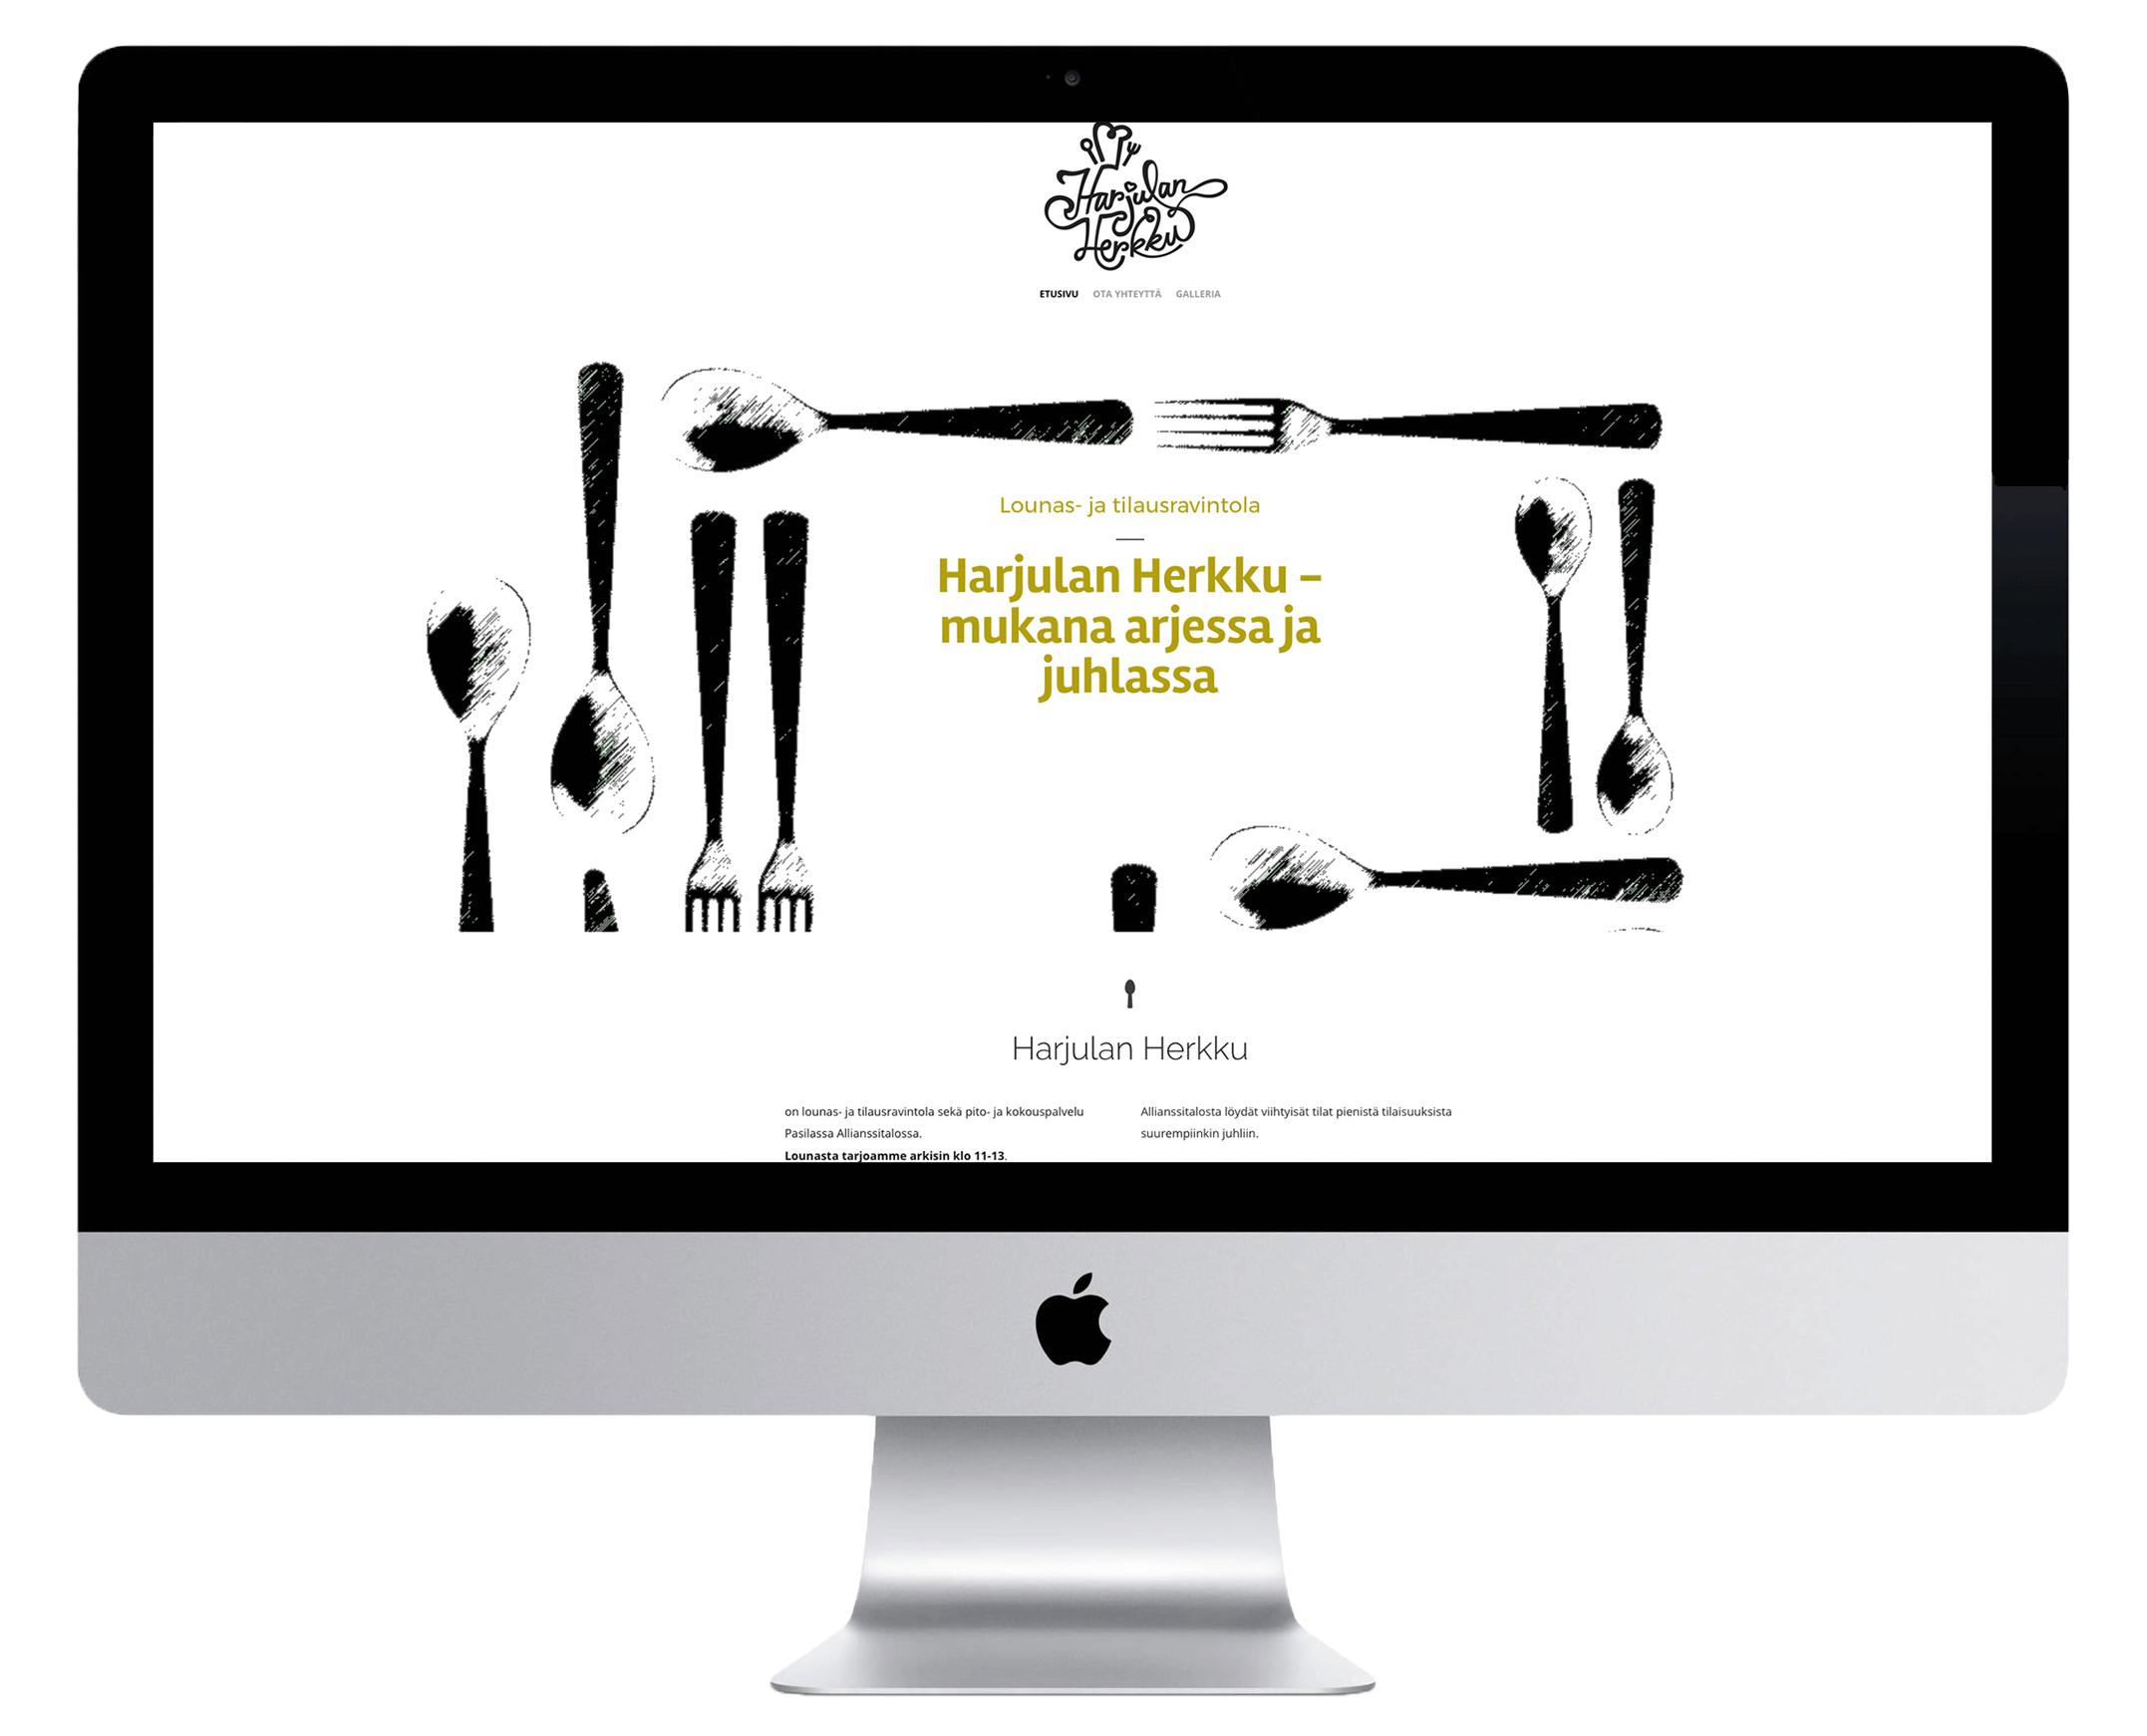 c.e.s design / Harjulan Herkku